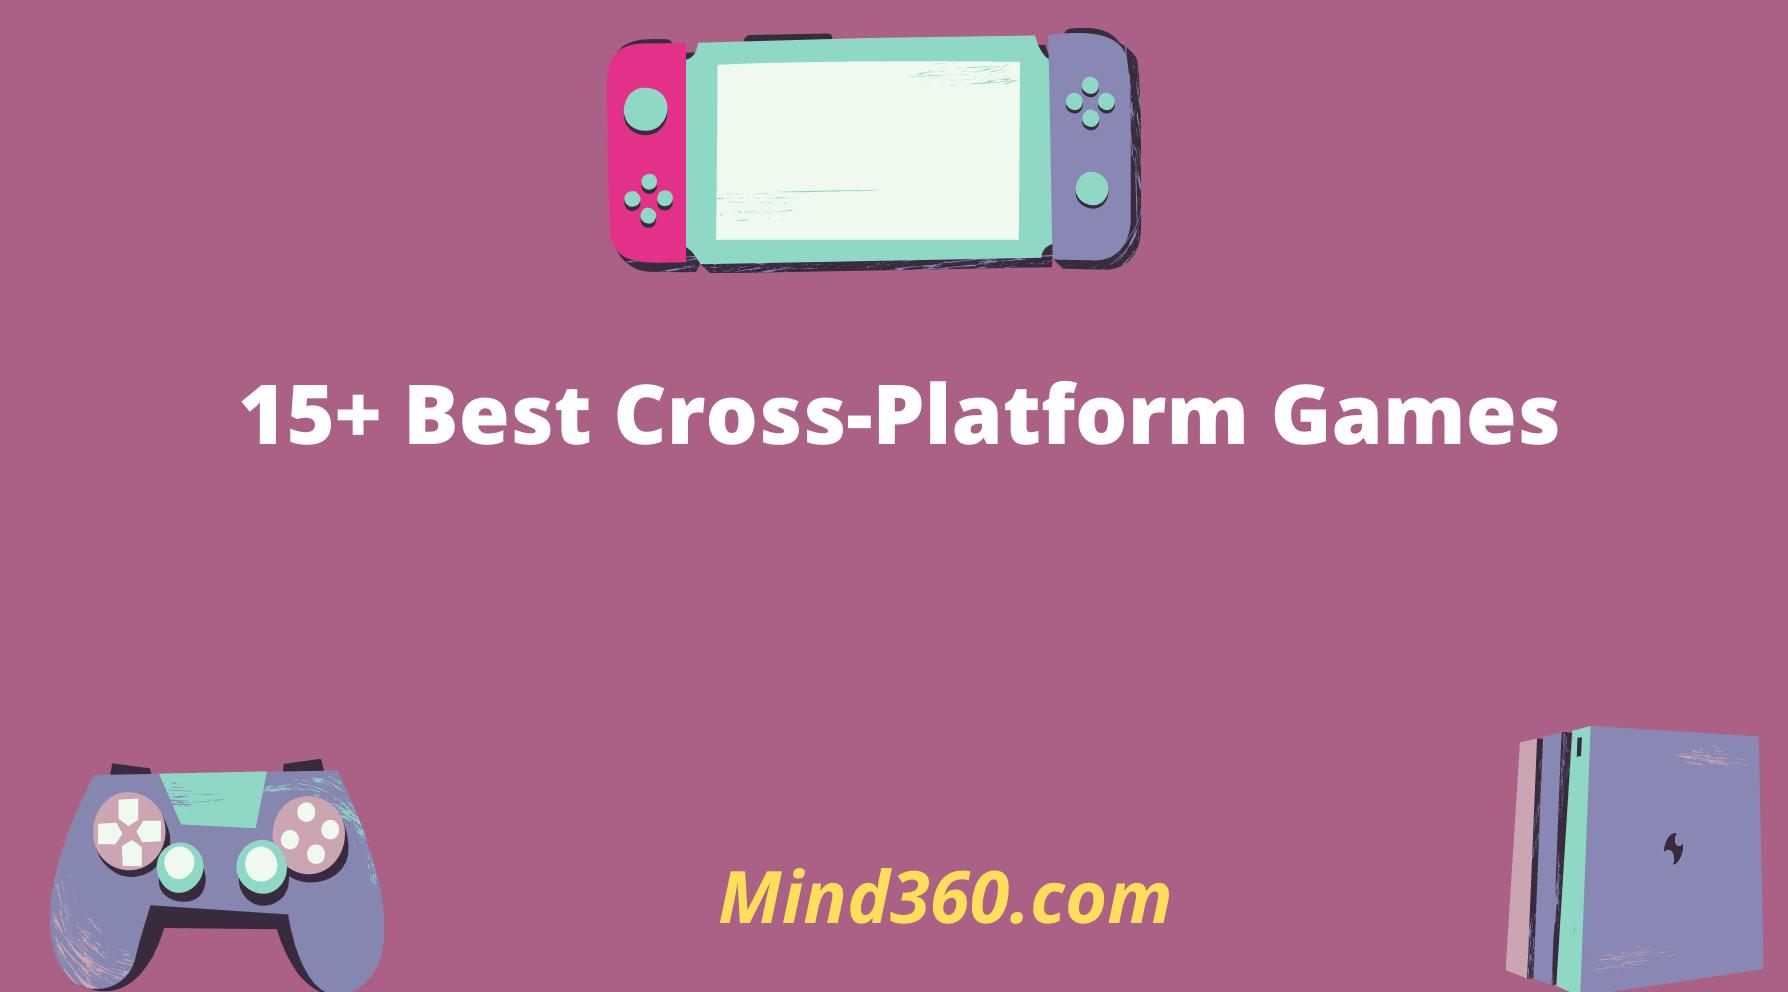 Cross-platform Games